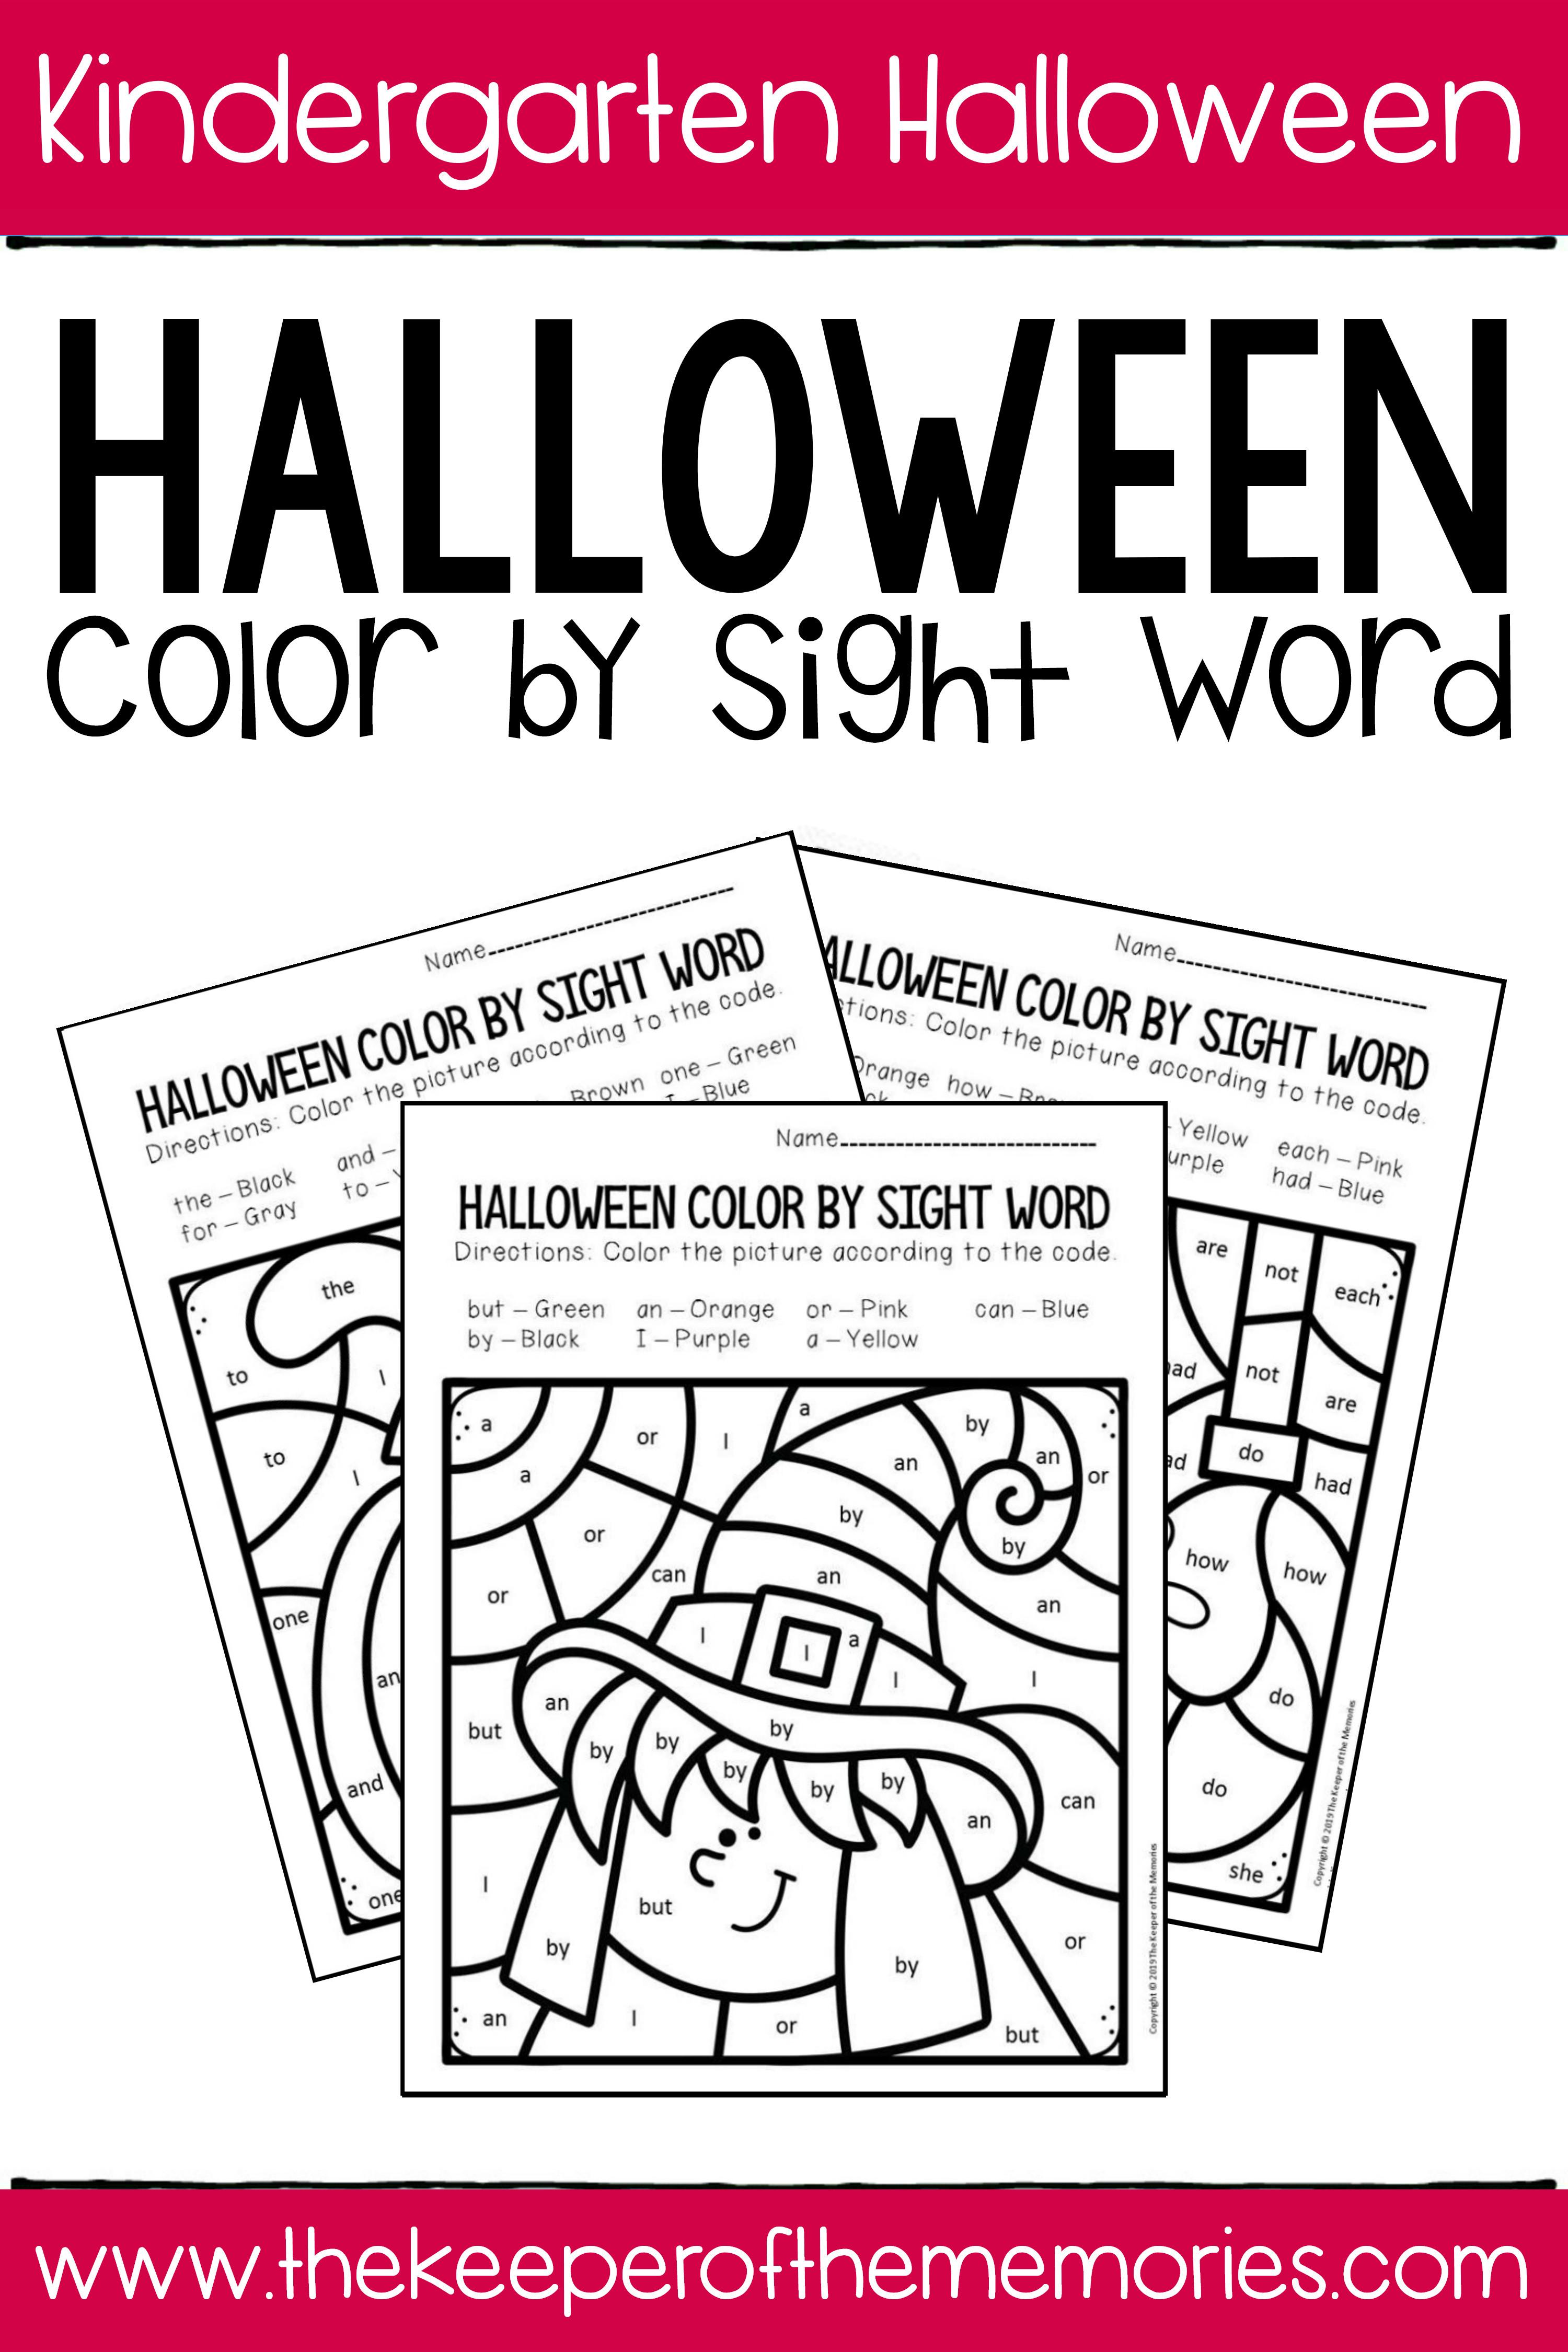 Kindergarten Sight Word Coloring Worksheets Color by Sight Word Halloween Kindergarten Worksheets